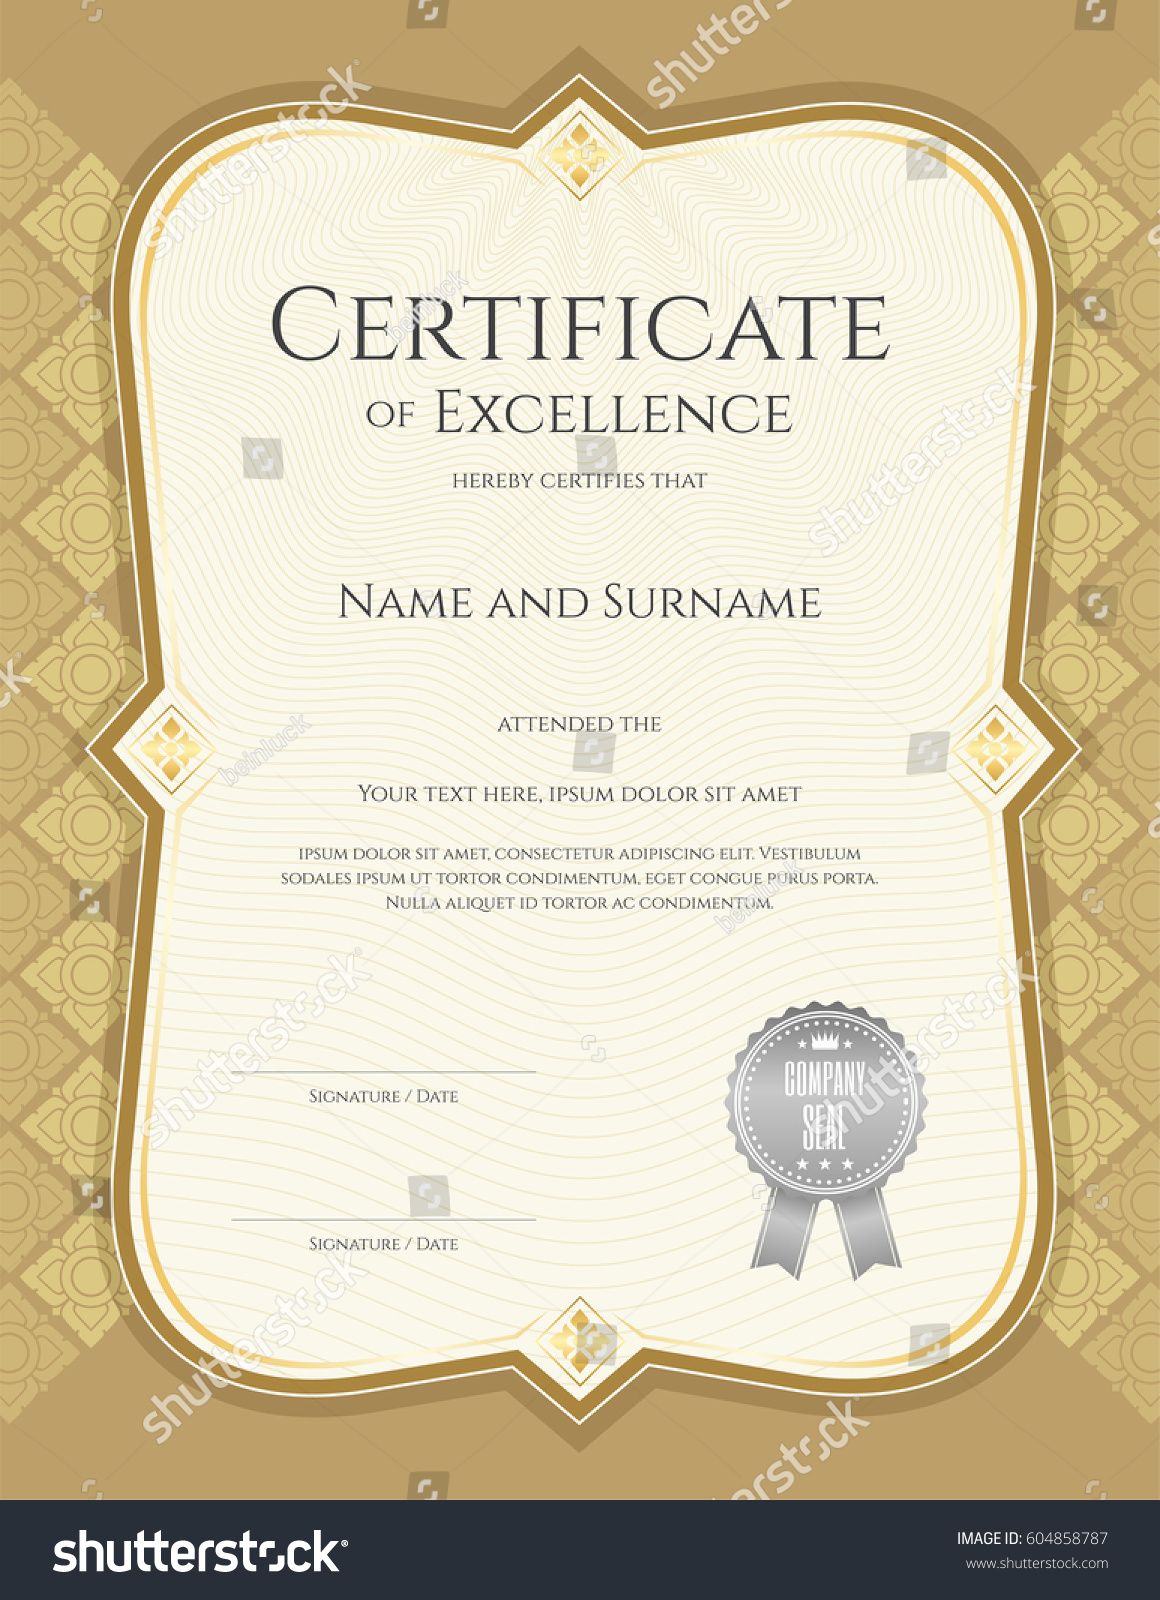 Portrait Certificate Achievement Template Vector Applied Stock